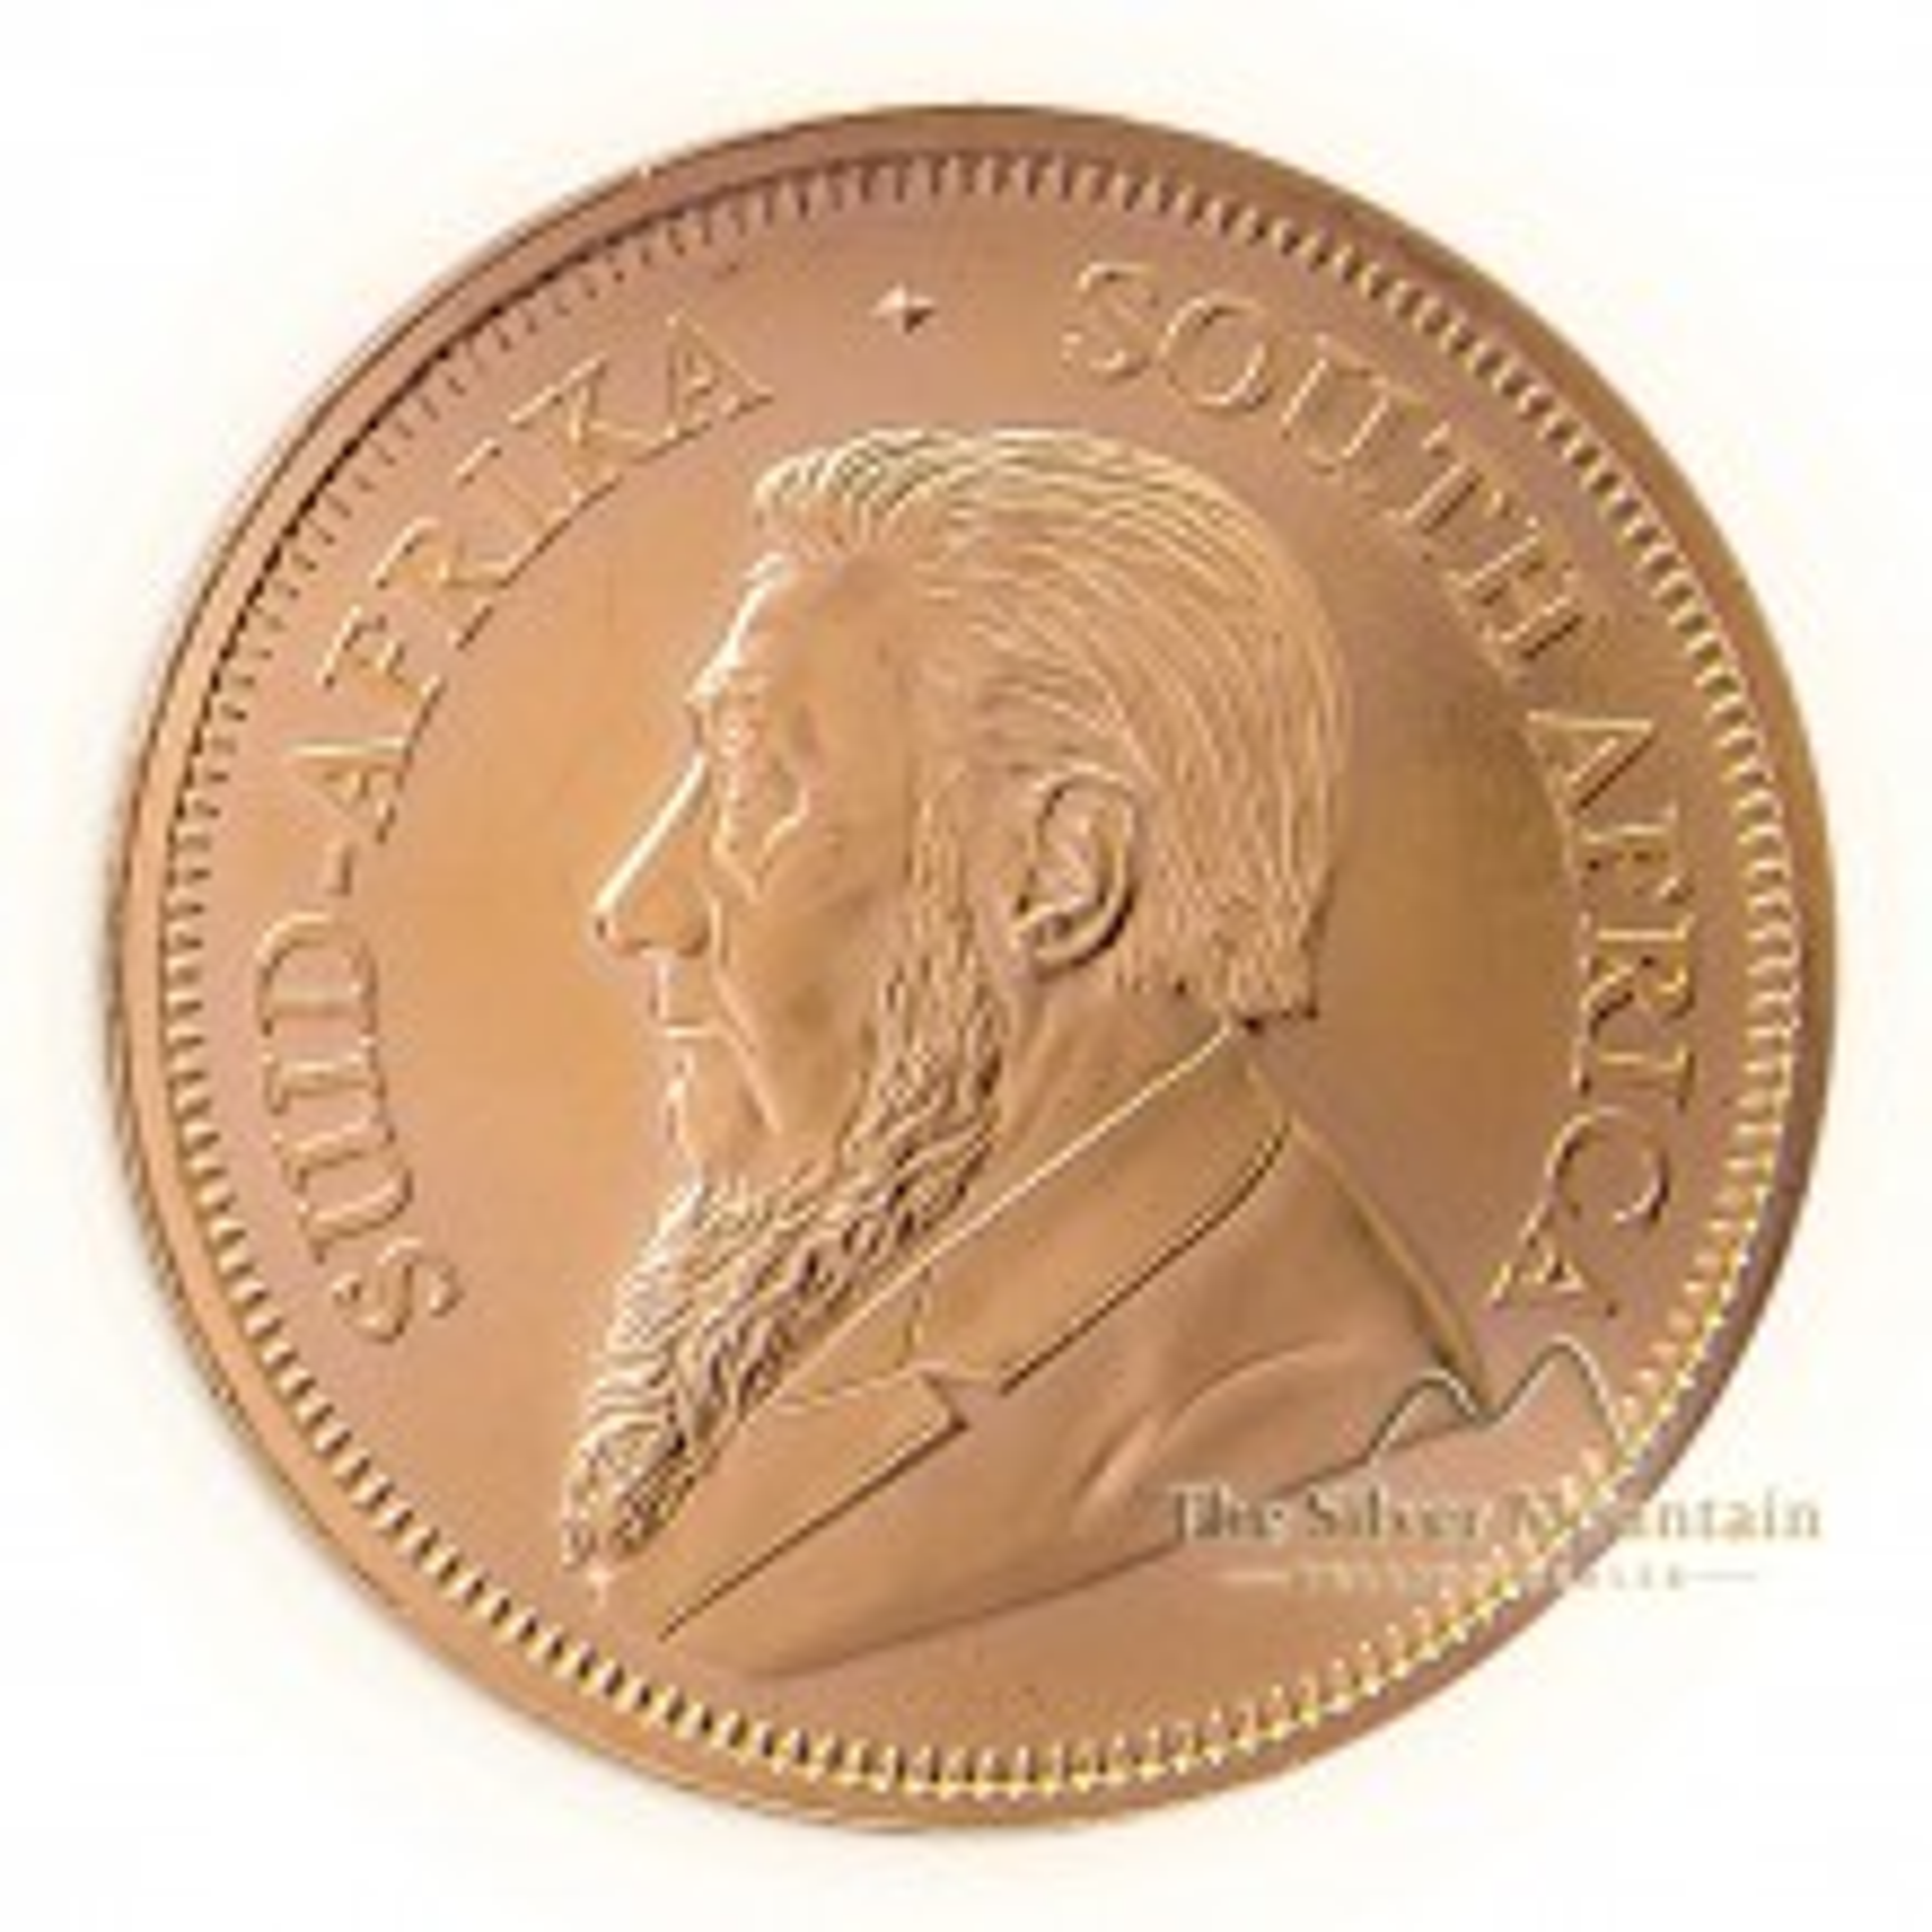 Nieuwe 1 troy ounce gouden Krugerrand 2019